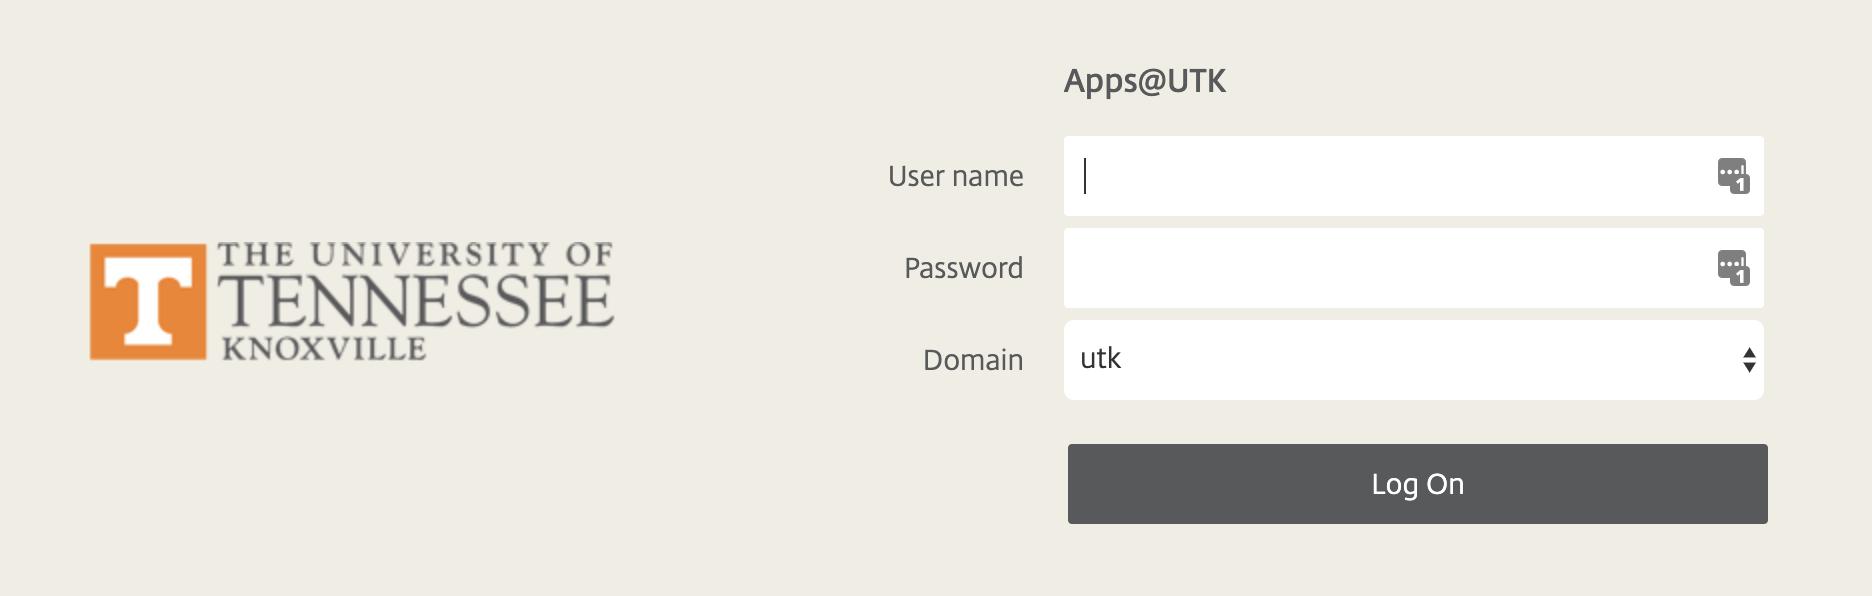 Image of log-in screen for Apps@UTK.